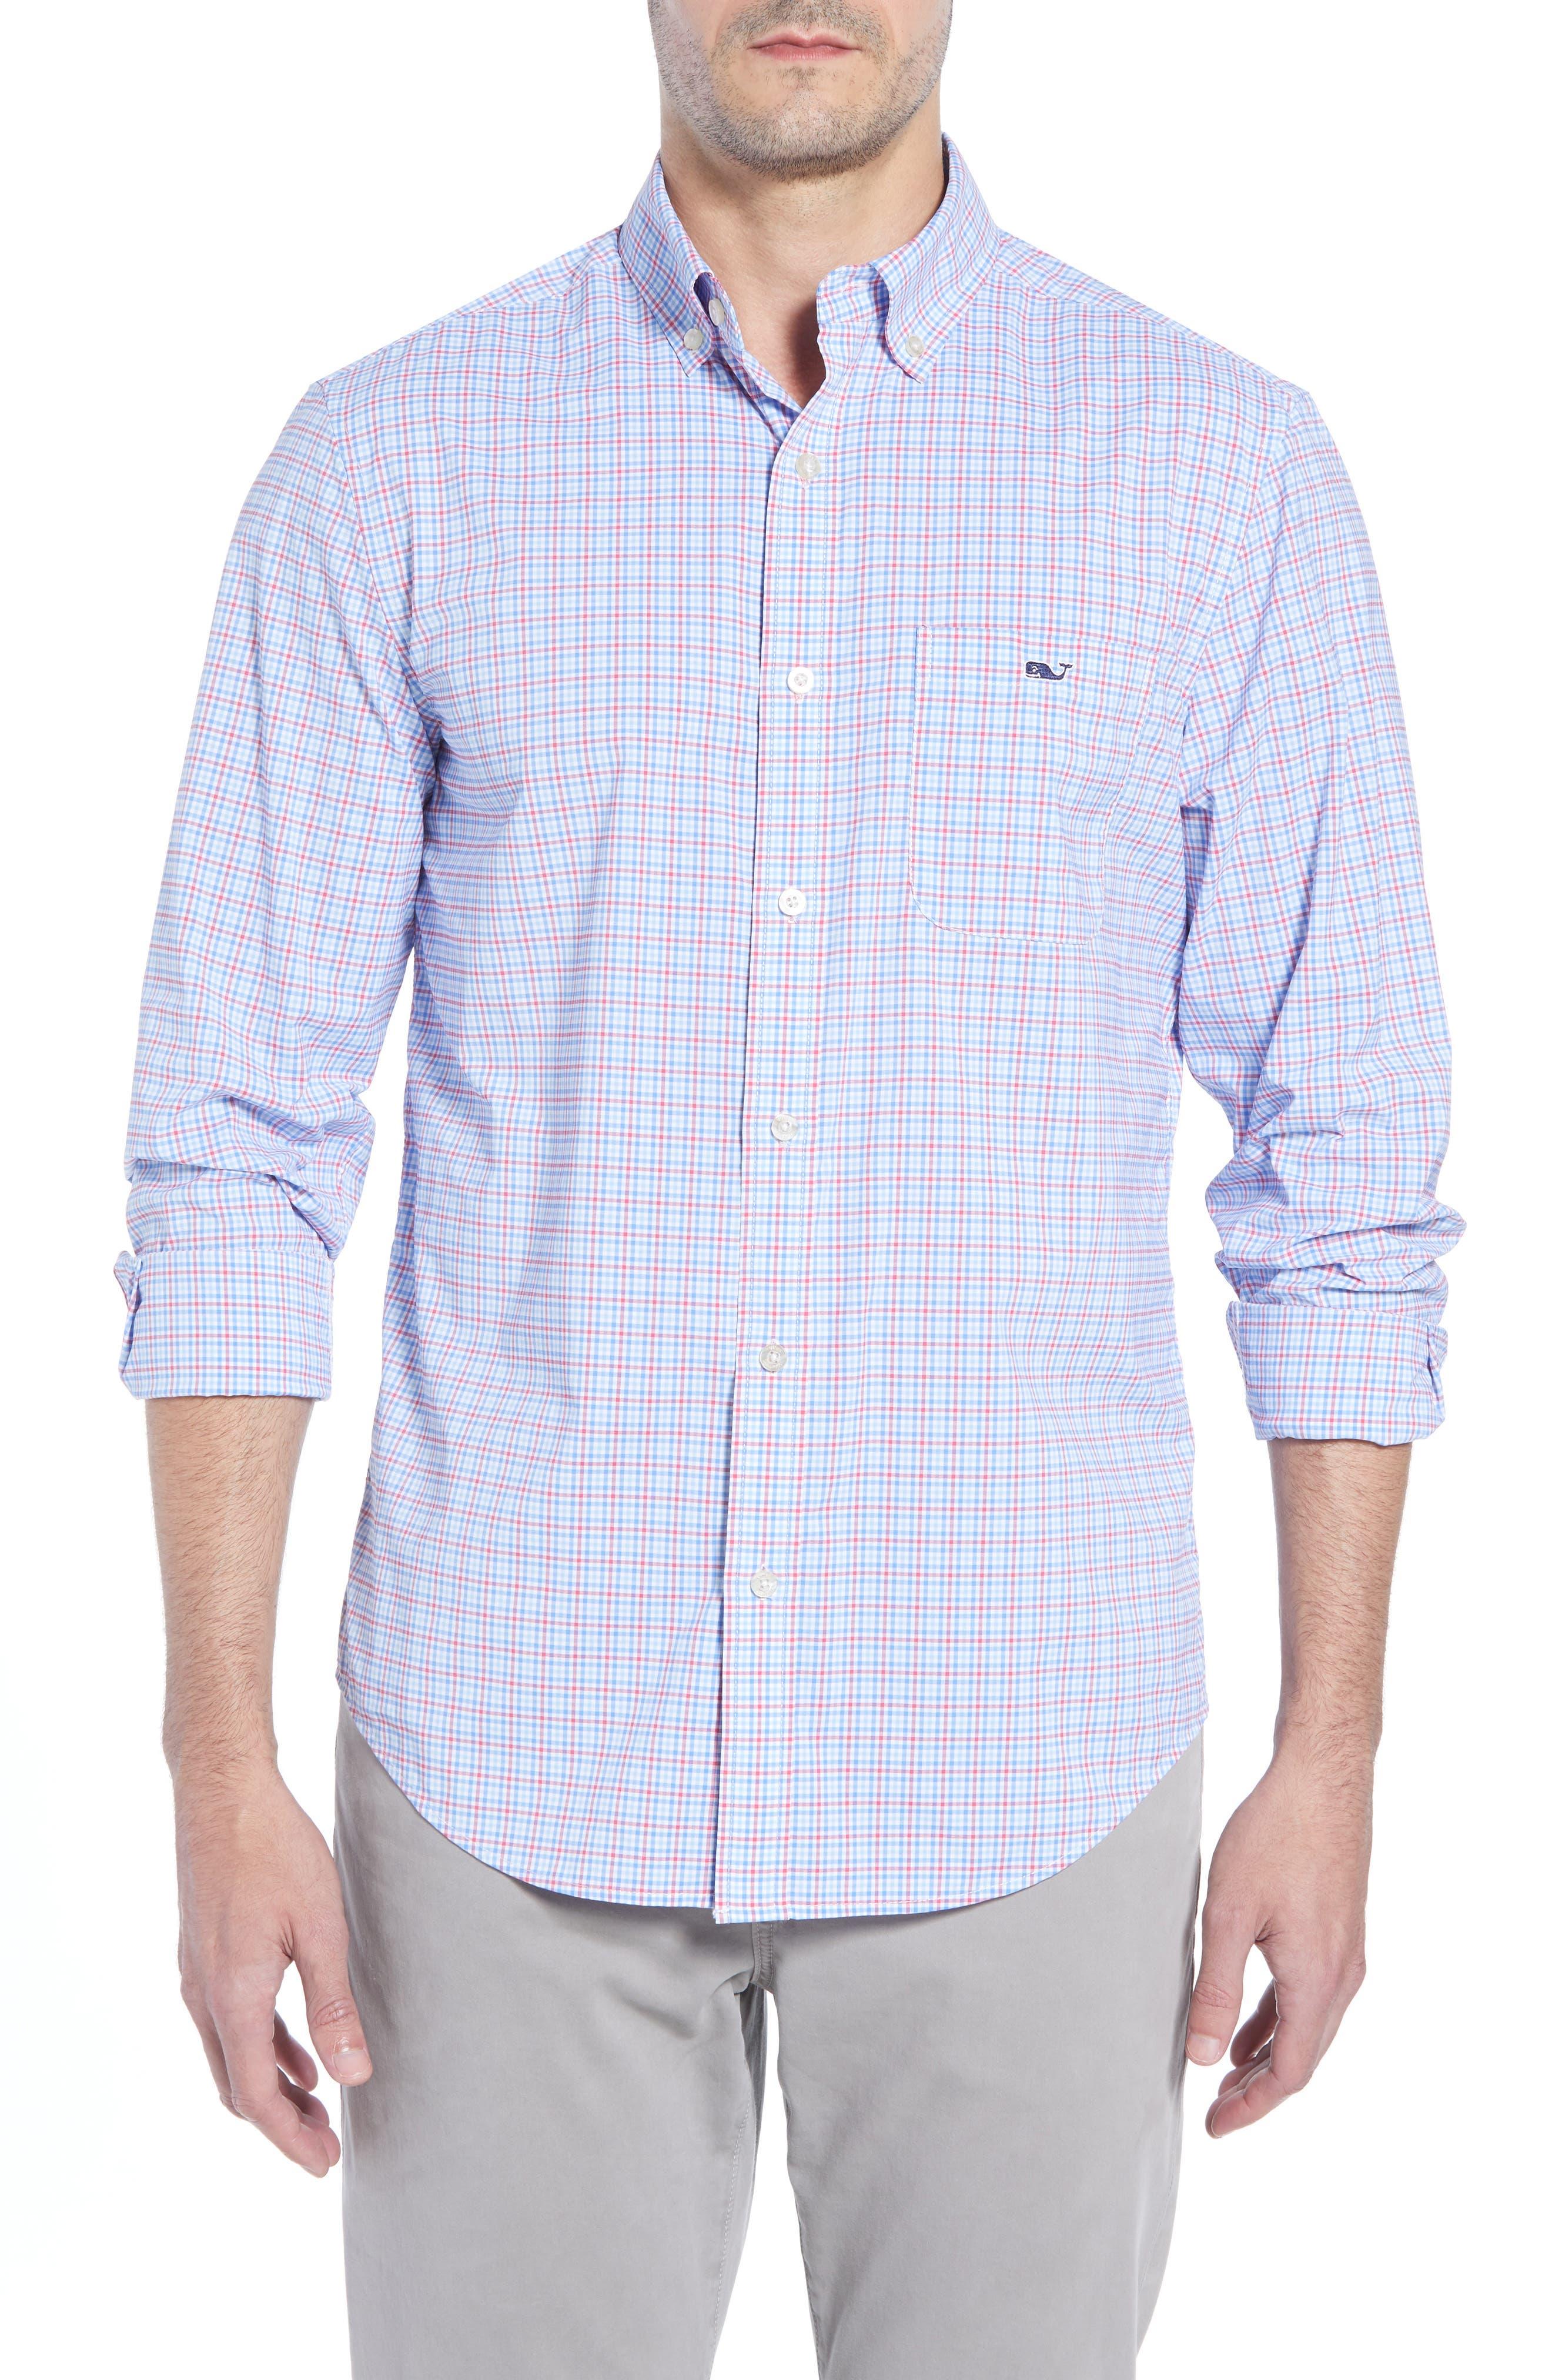 Boldwater Regular Fit Plaid Sport Shirt,                             Main thumbnail 1, color,                             SAILORS RED